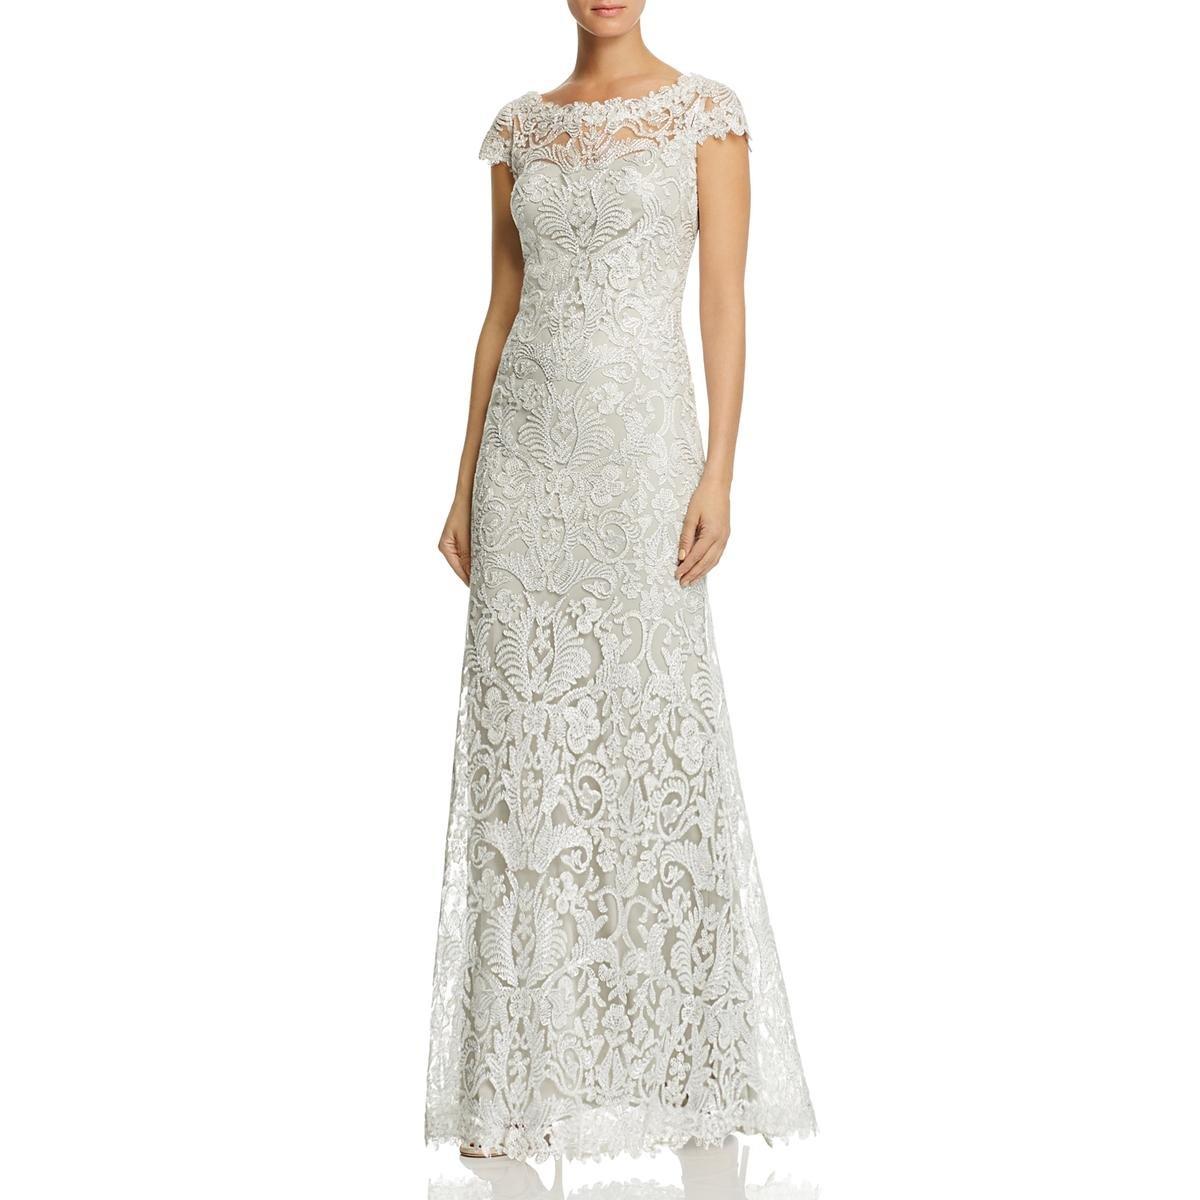 Tadashi Shoji Womens Petites Gown Sleeveless Evening Dress Silver ...